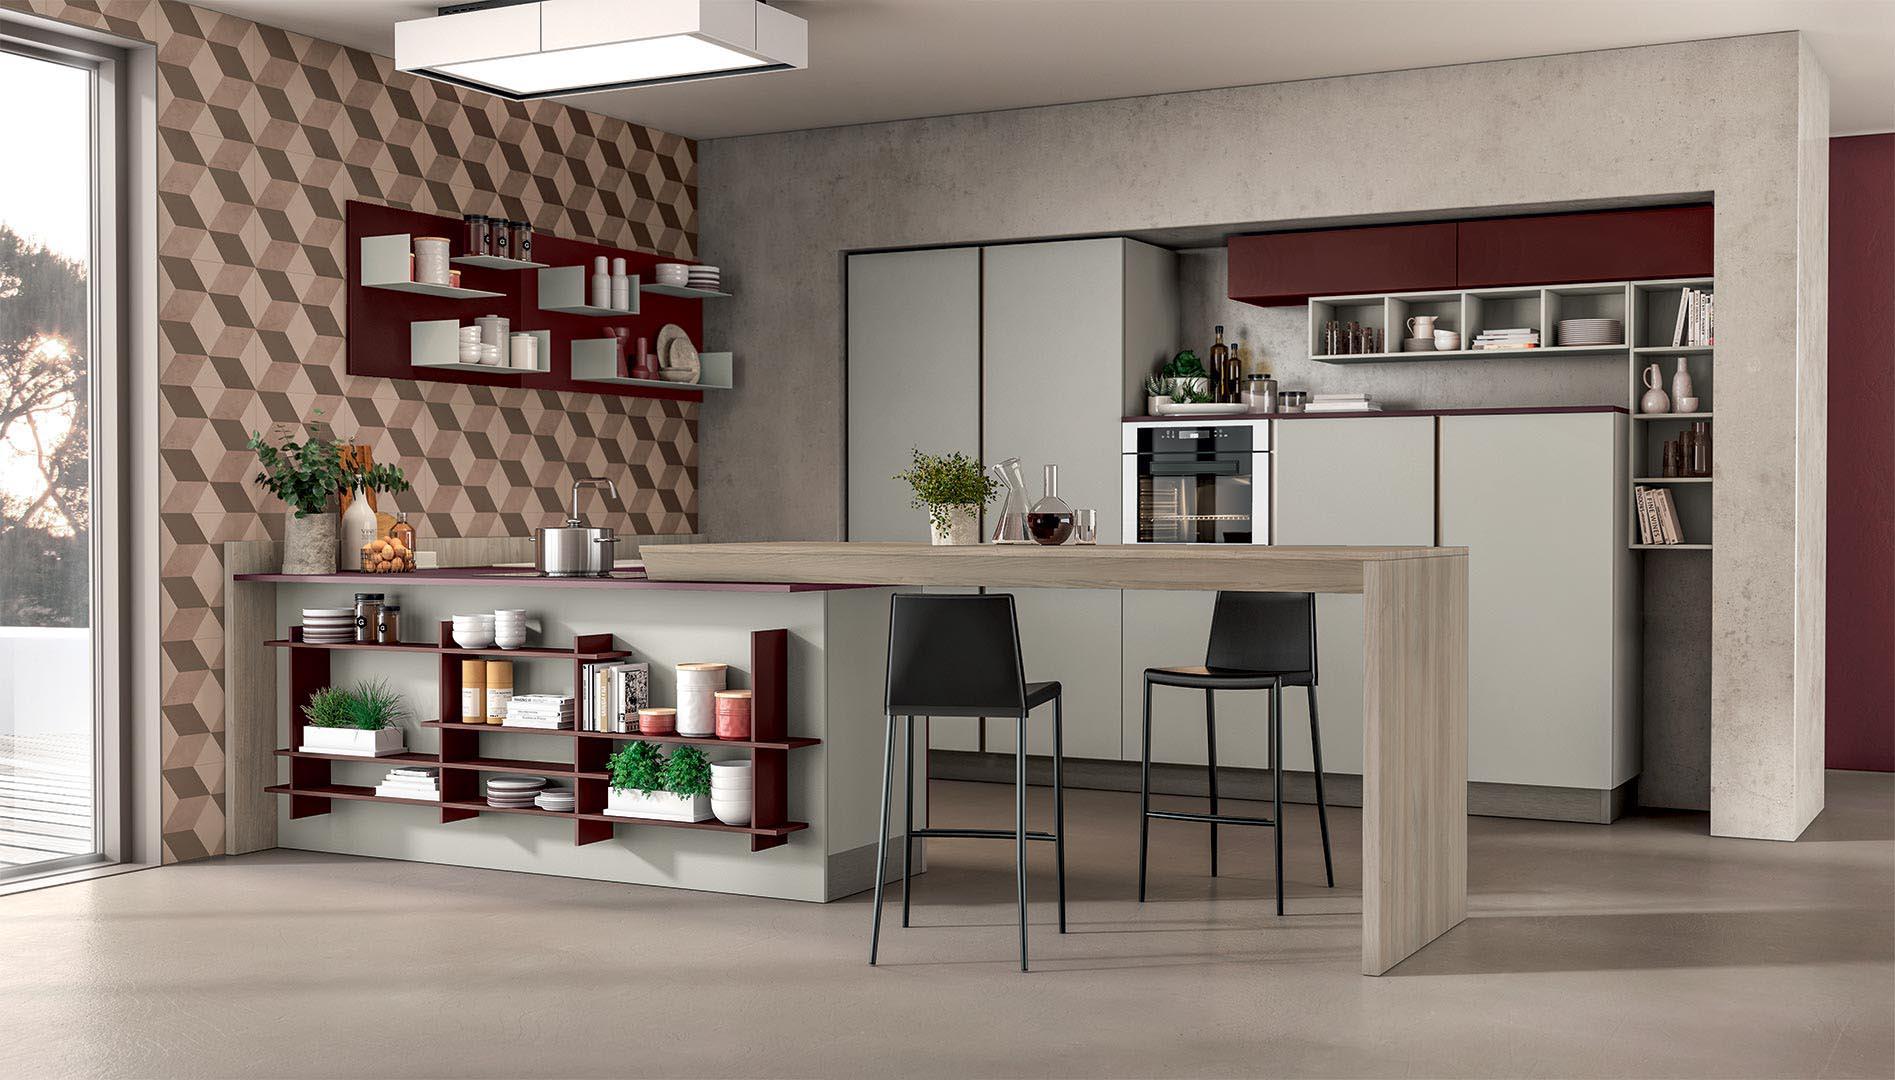 Immagina Plus - Cucine Moderne - Cucine LUBE